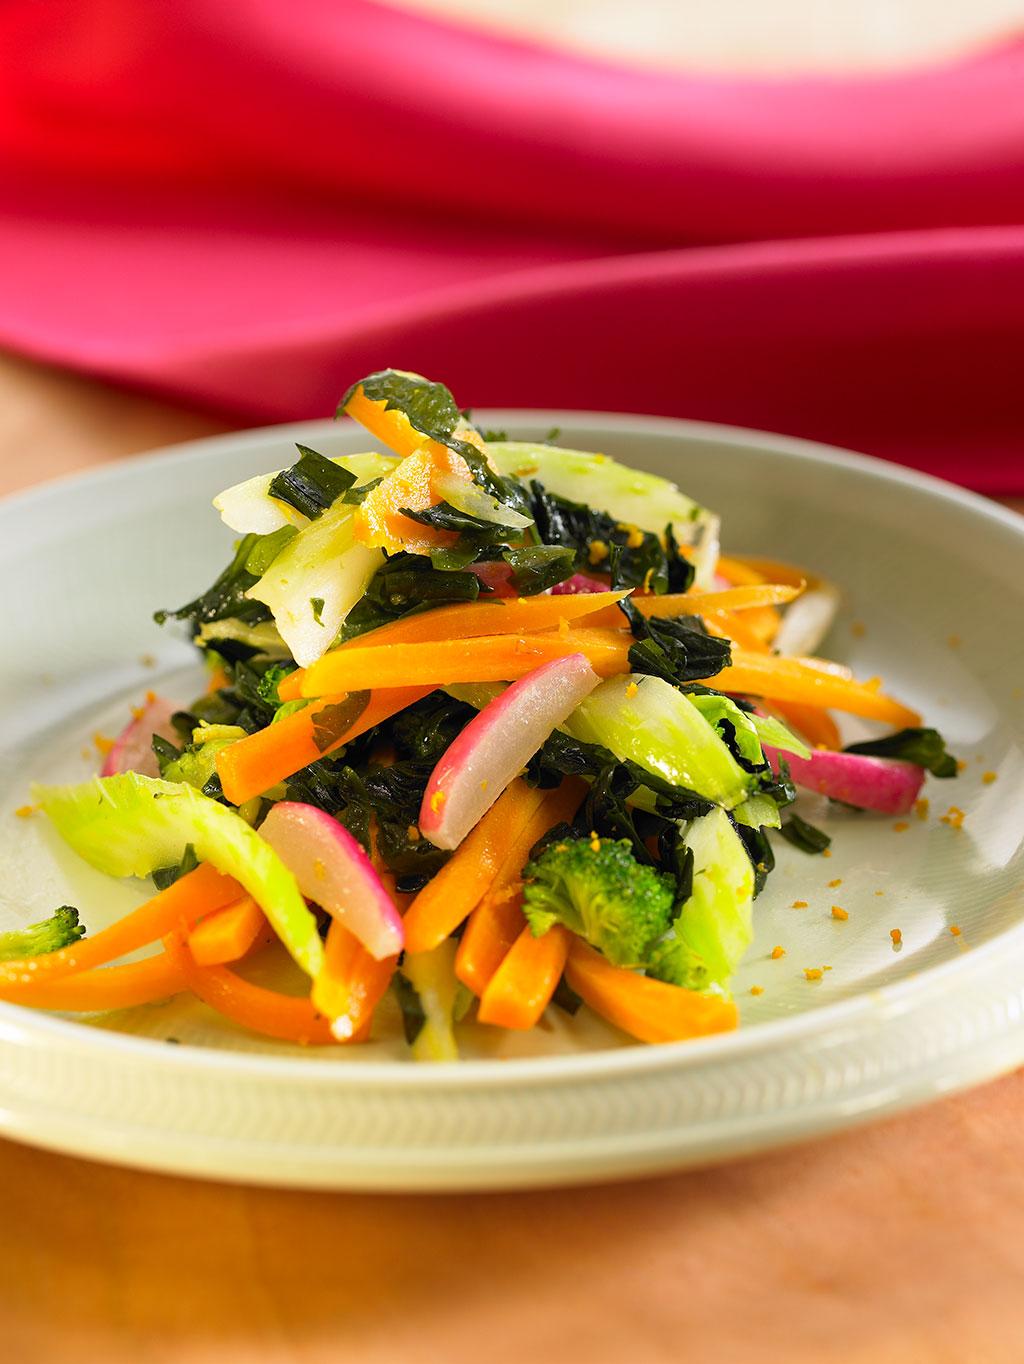 cocina-energetica-ensalada-tibia-de-verduras